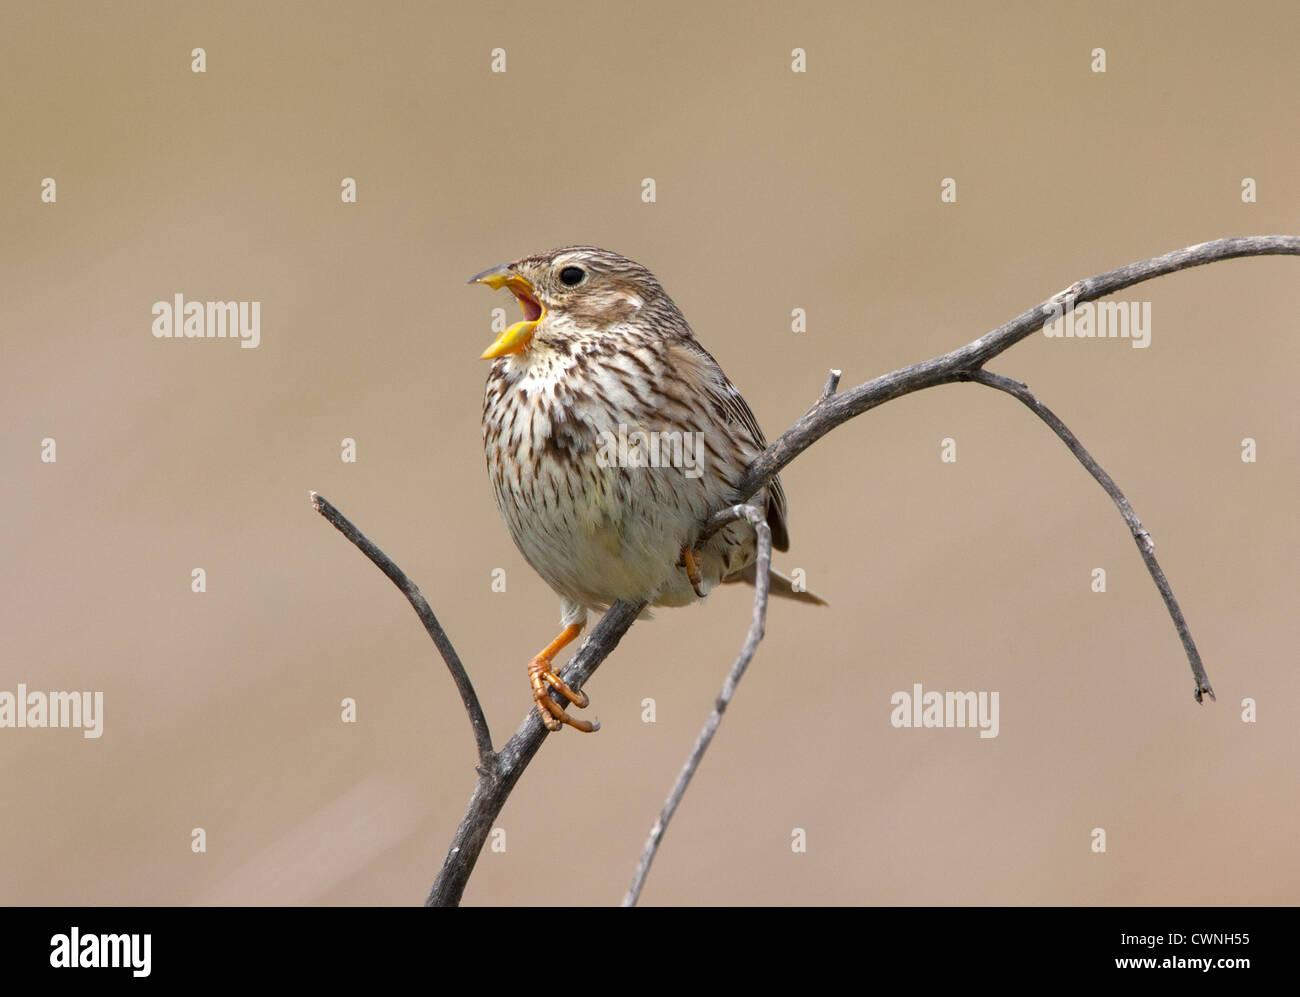 - Emberiza calandra Corn bunting perché sur une branche en chantant Photo Stock